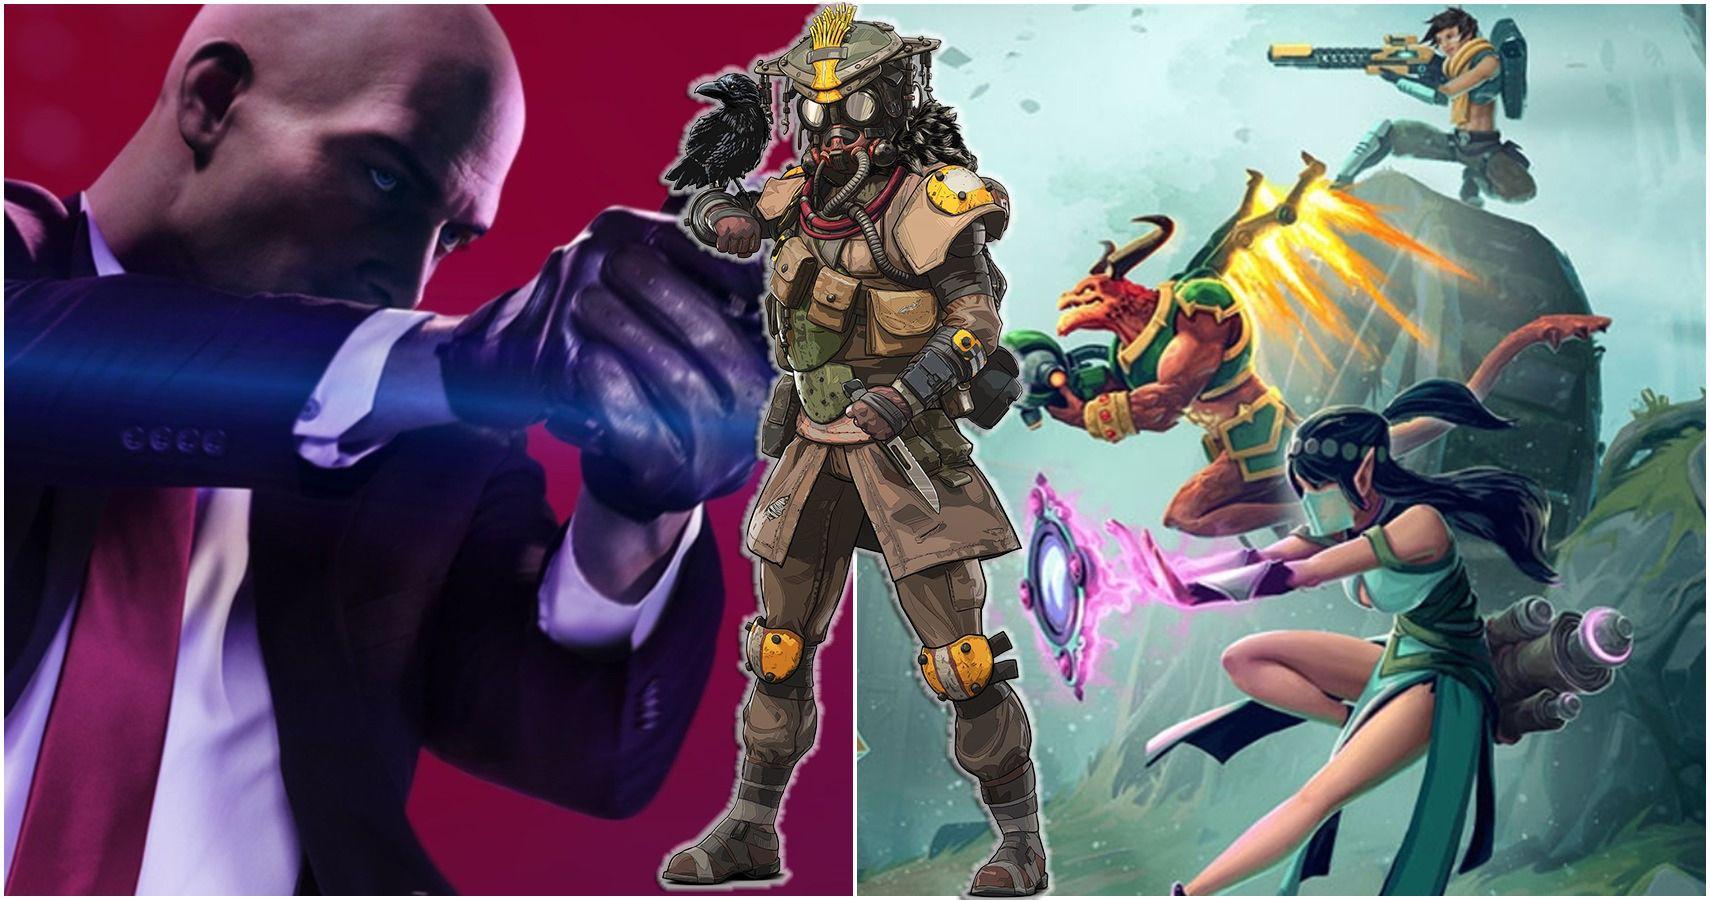 Best Modern FPS Games 2020 [The Ultimate List] - GamingScan